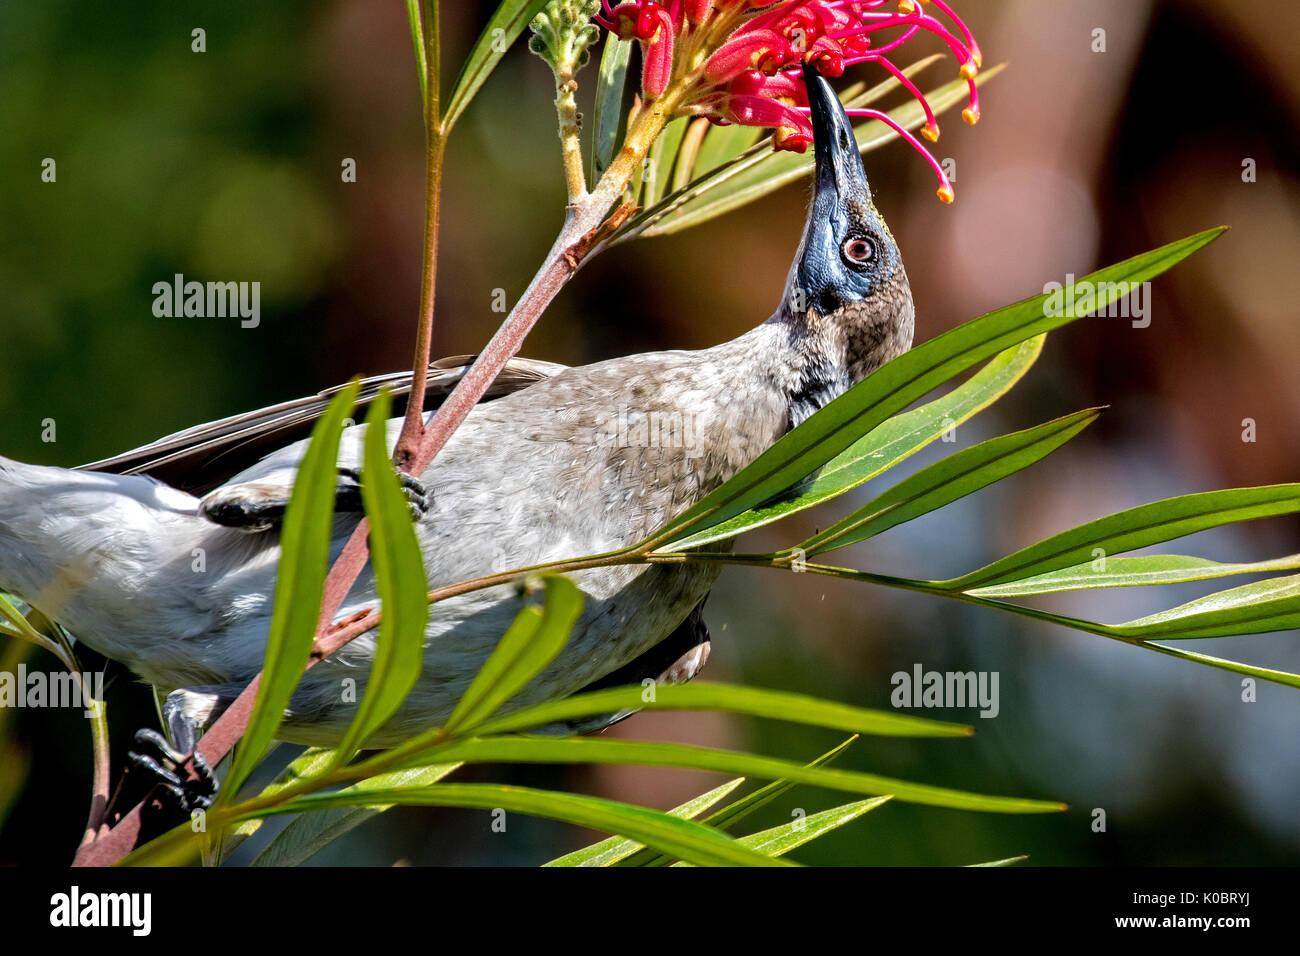 Little friarbird feeding on nectar - Stock Image